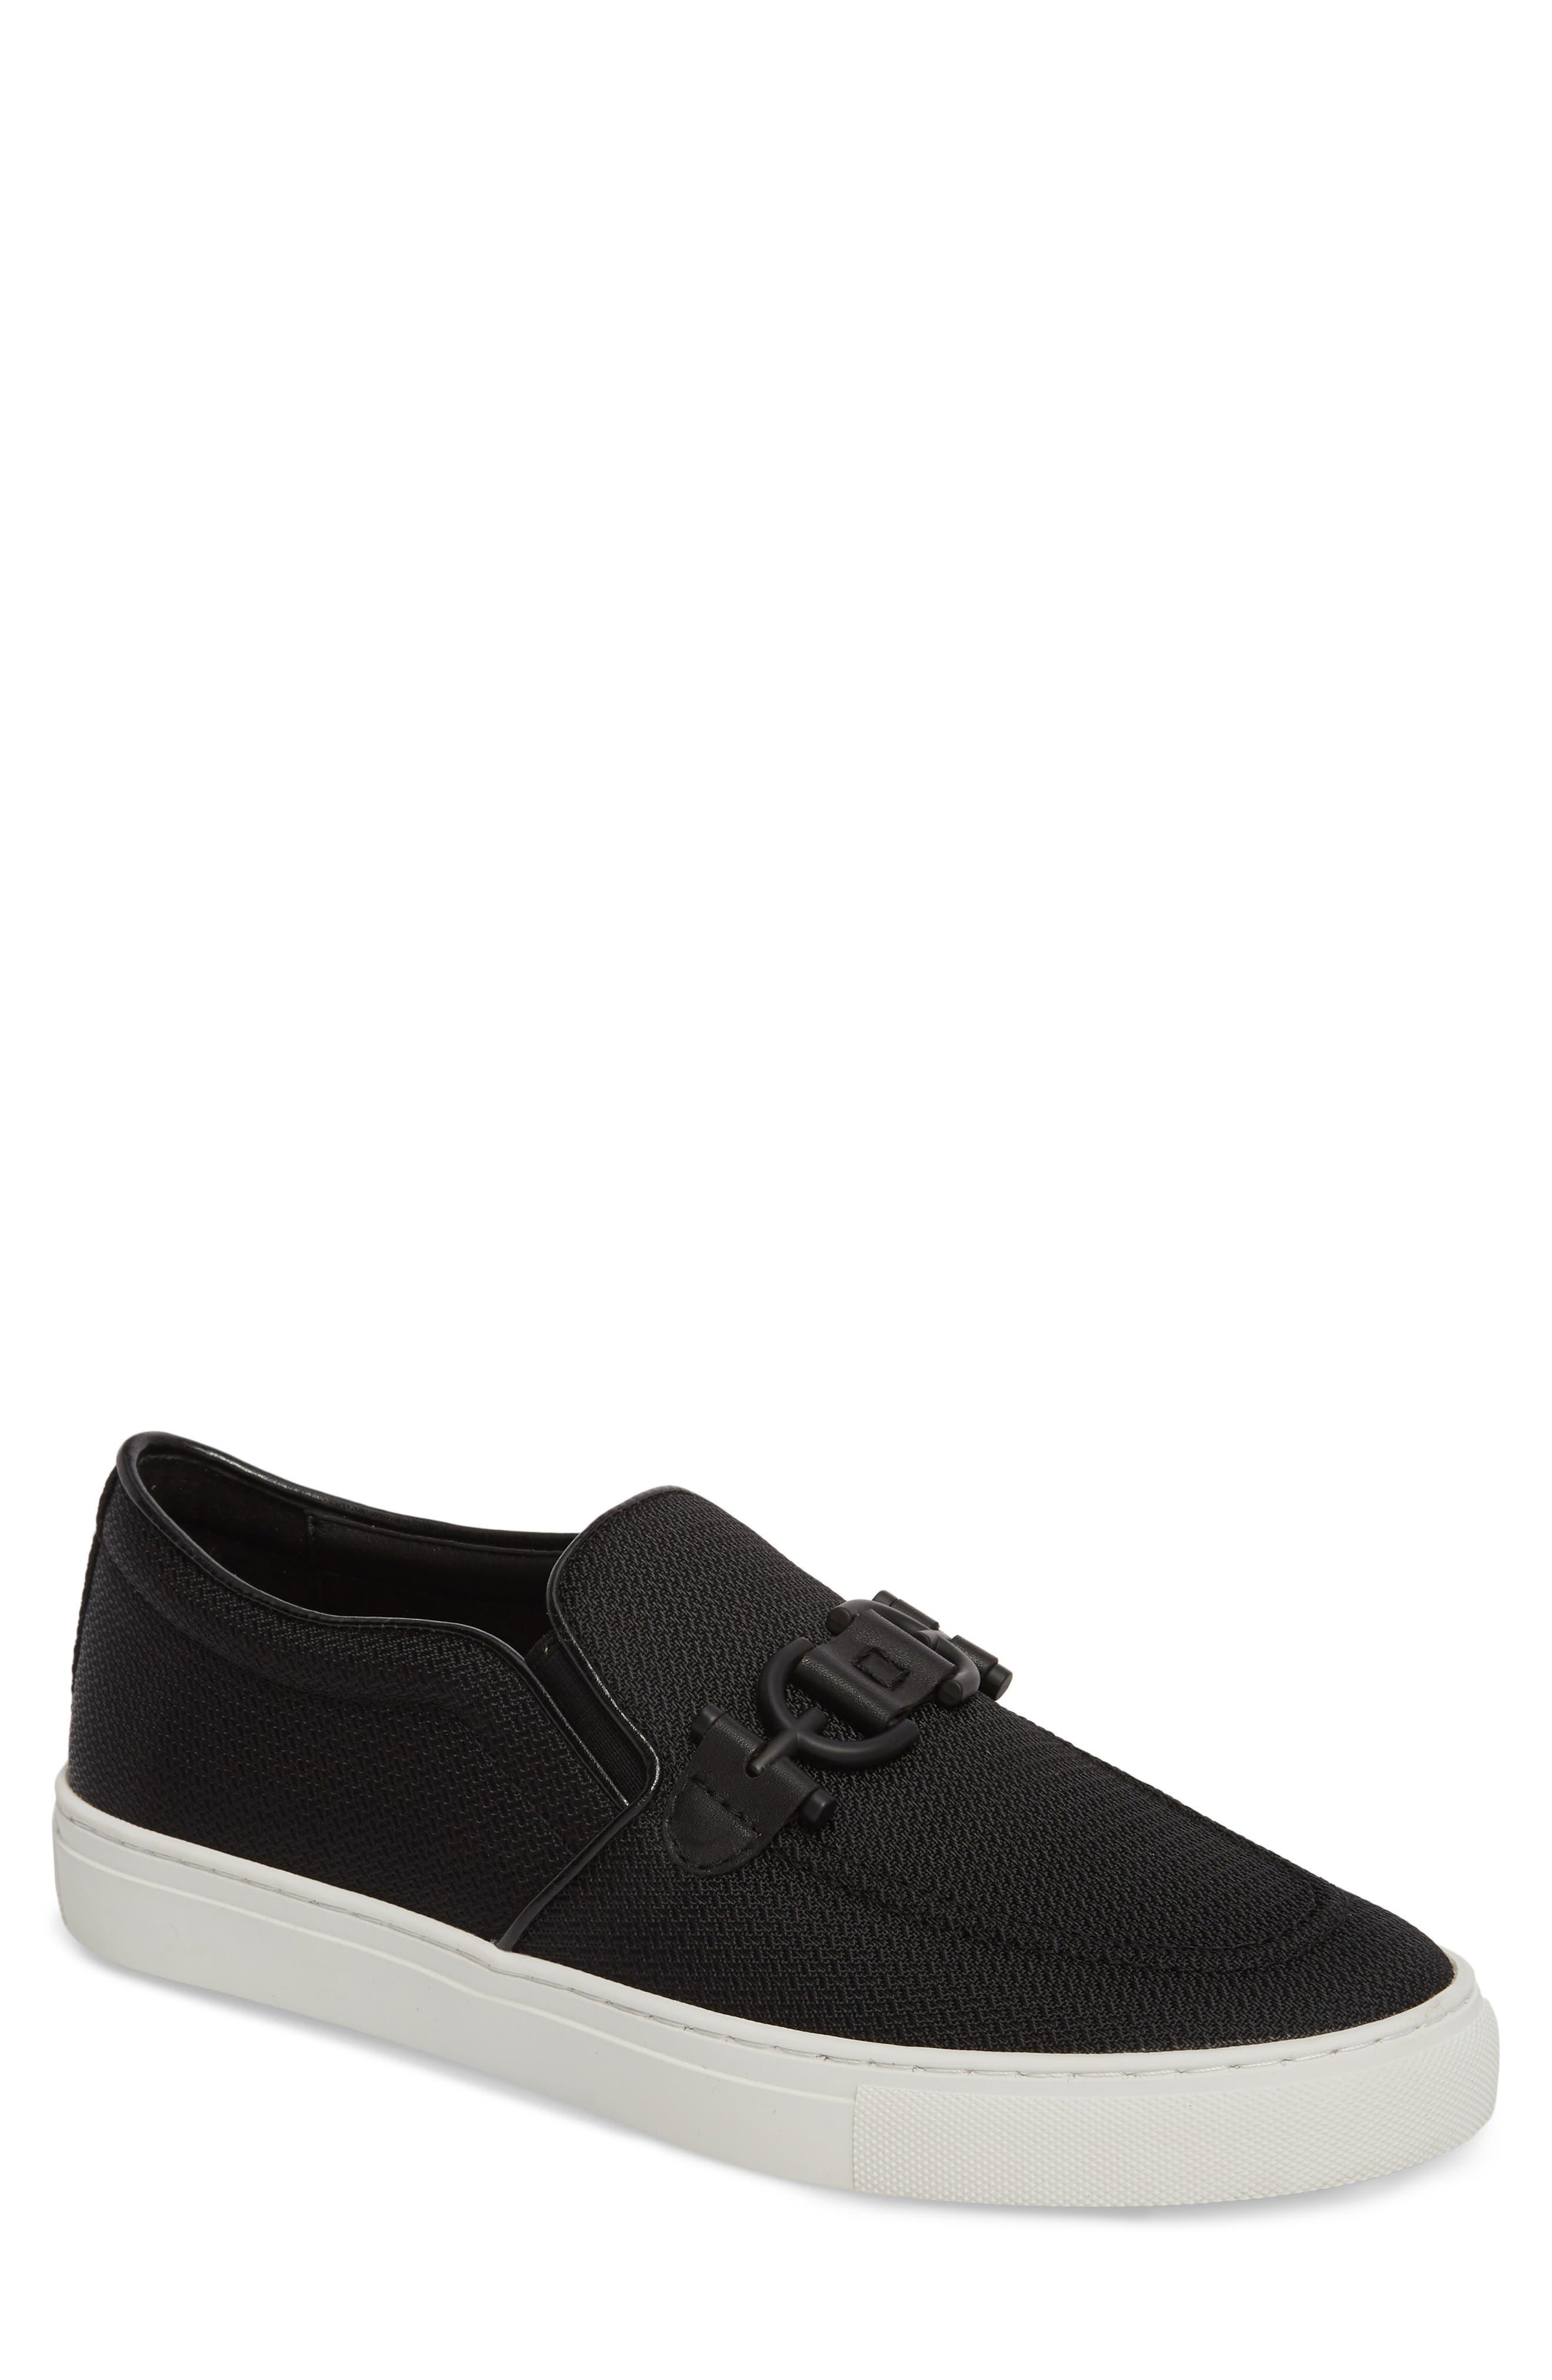 Andor Bit Slip-On Sneaker,                         Main,                         color, 001